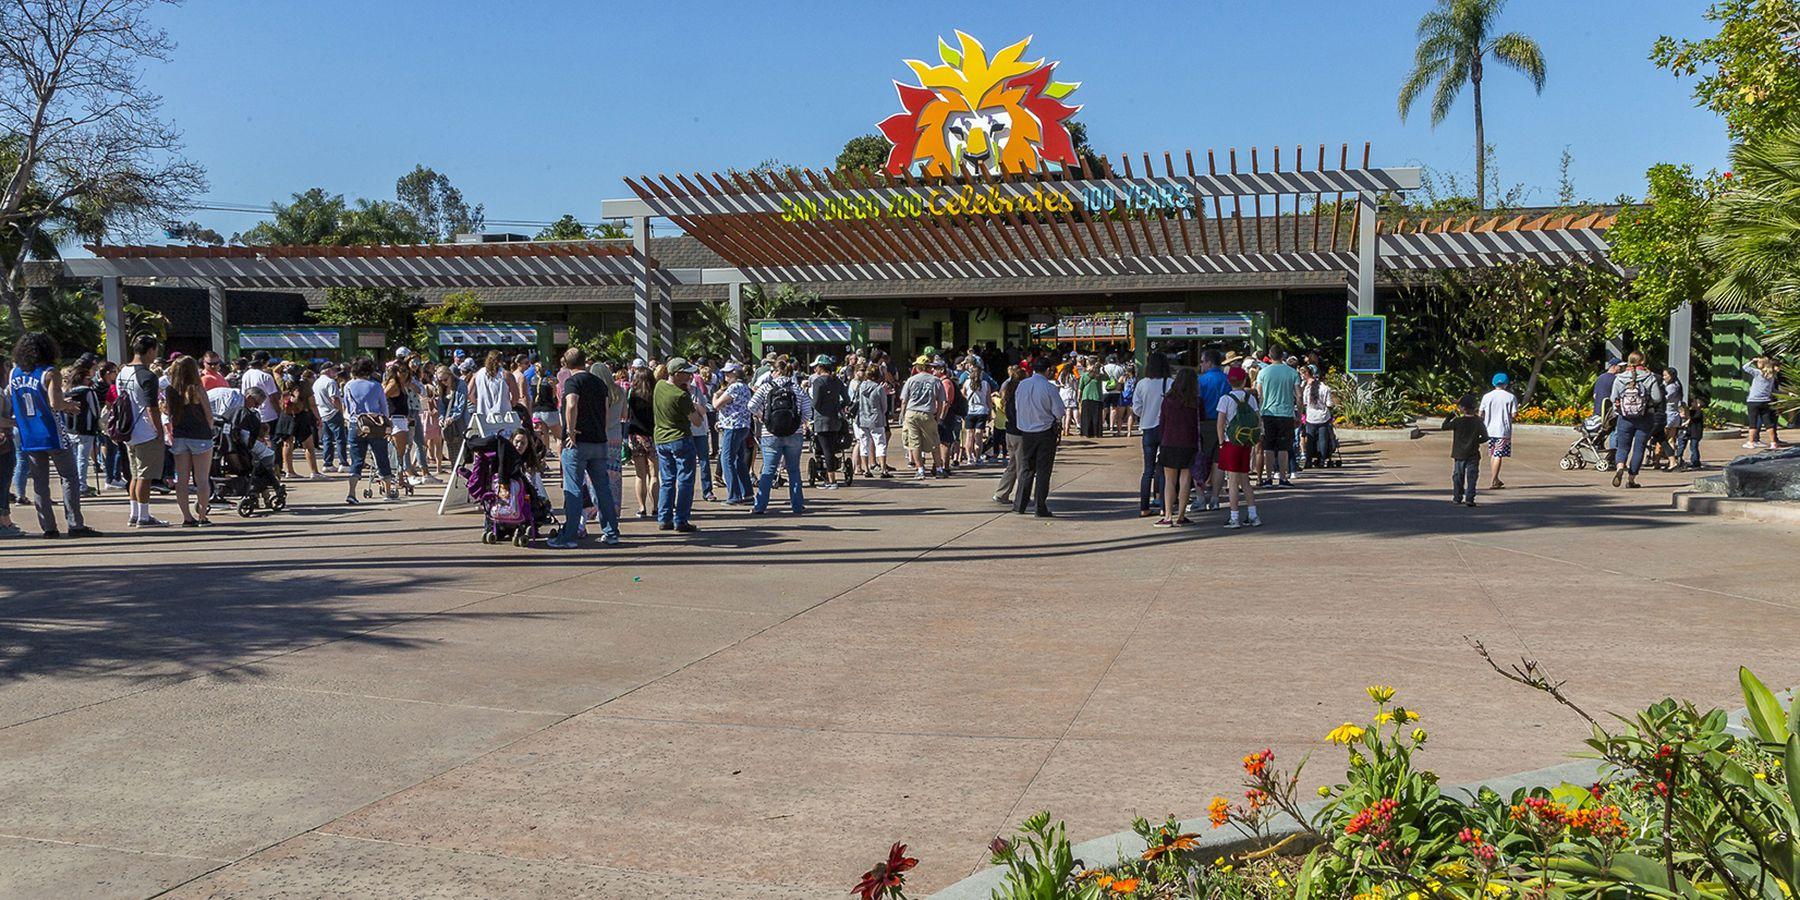 San Diego Zoo - California - Amerika - Doets Reizen